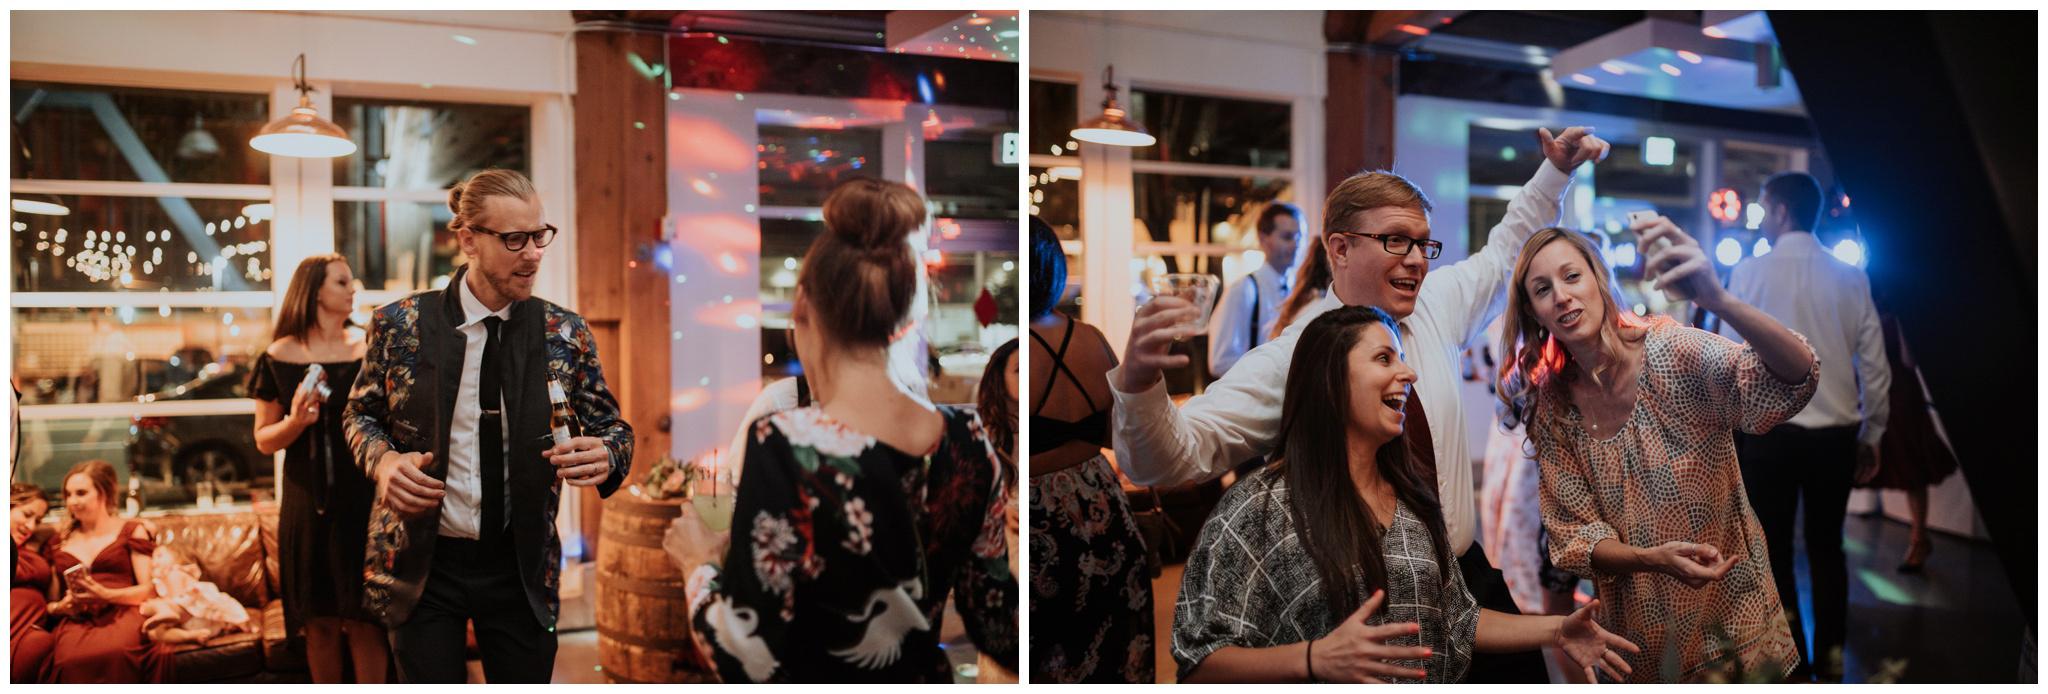 alyssa-keiran-westland-distillery-urban-seattle-wedding-photographer-caitlyn-nikula-169.jpg